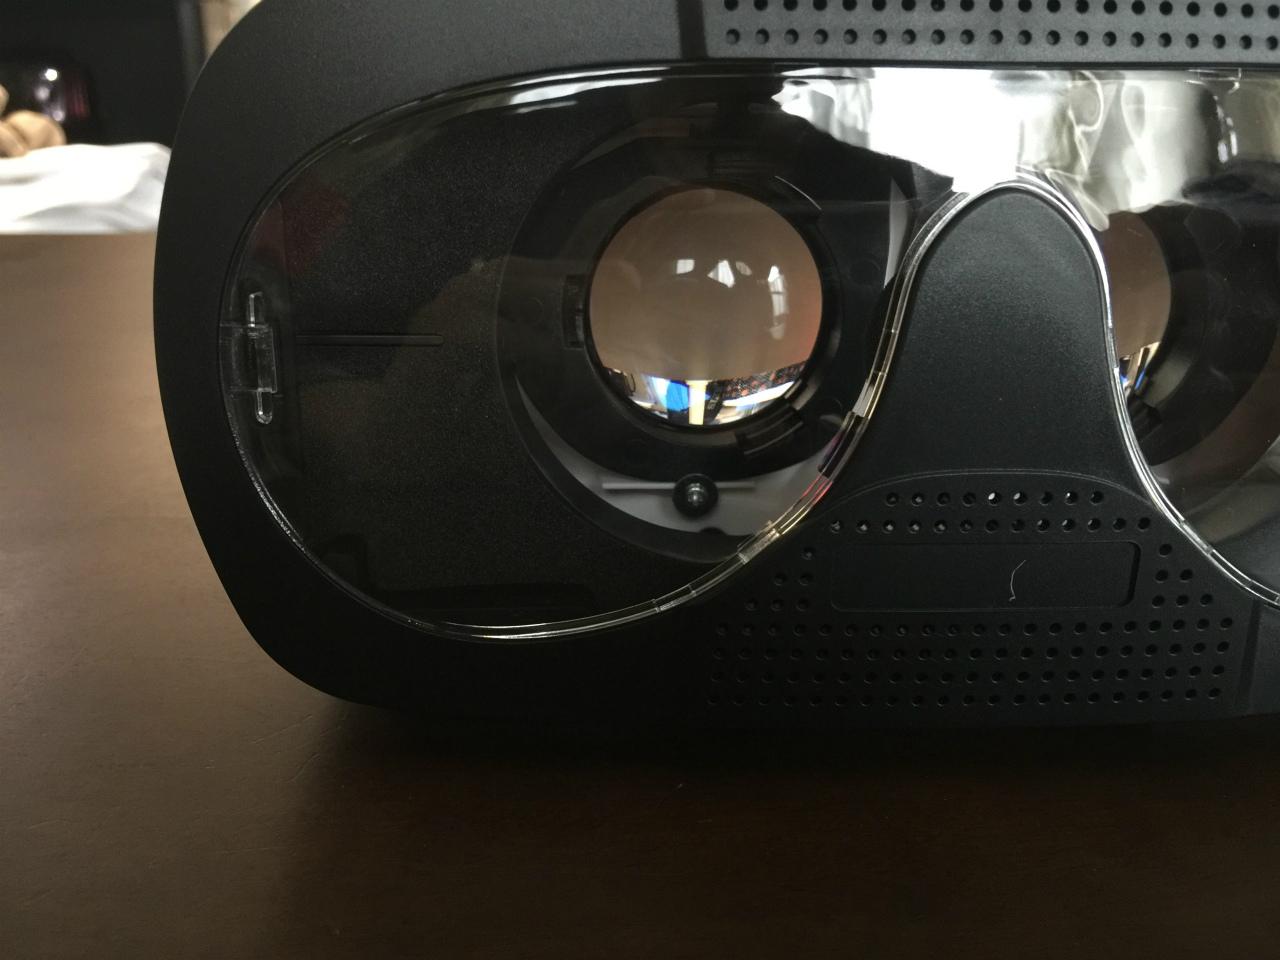 1213-201604_SoundSOUL 3D VR Glass G3 06